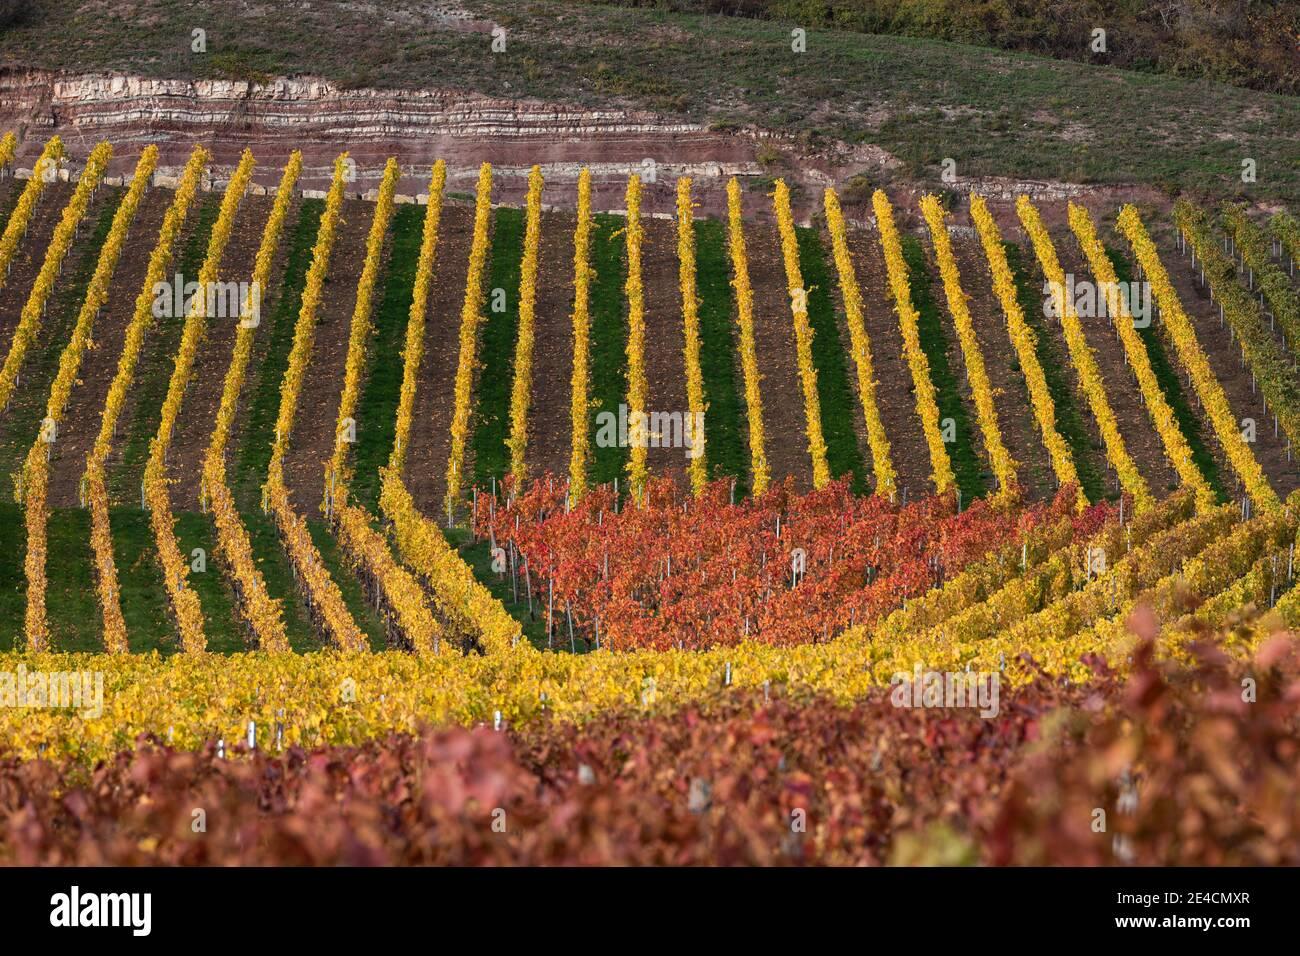 Europe, Germany, Baden-Wuerttemberg, Stromberg Heuchelberg Nature Park, Hohenhaslach, vineyard, autumn colors, Weitblickweg Stock Photo